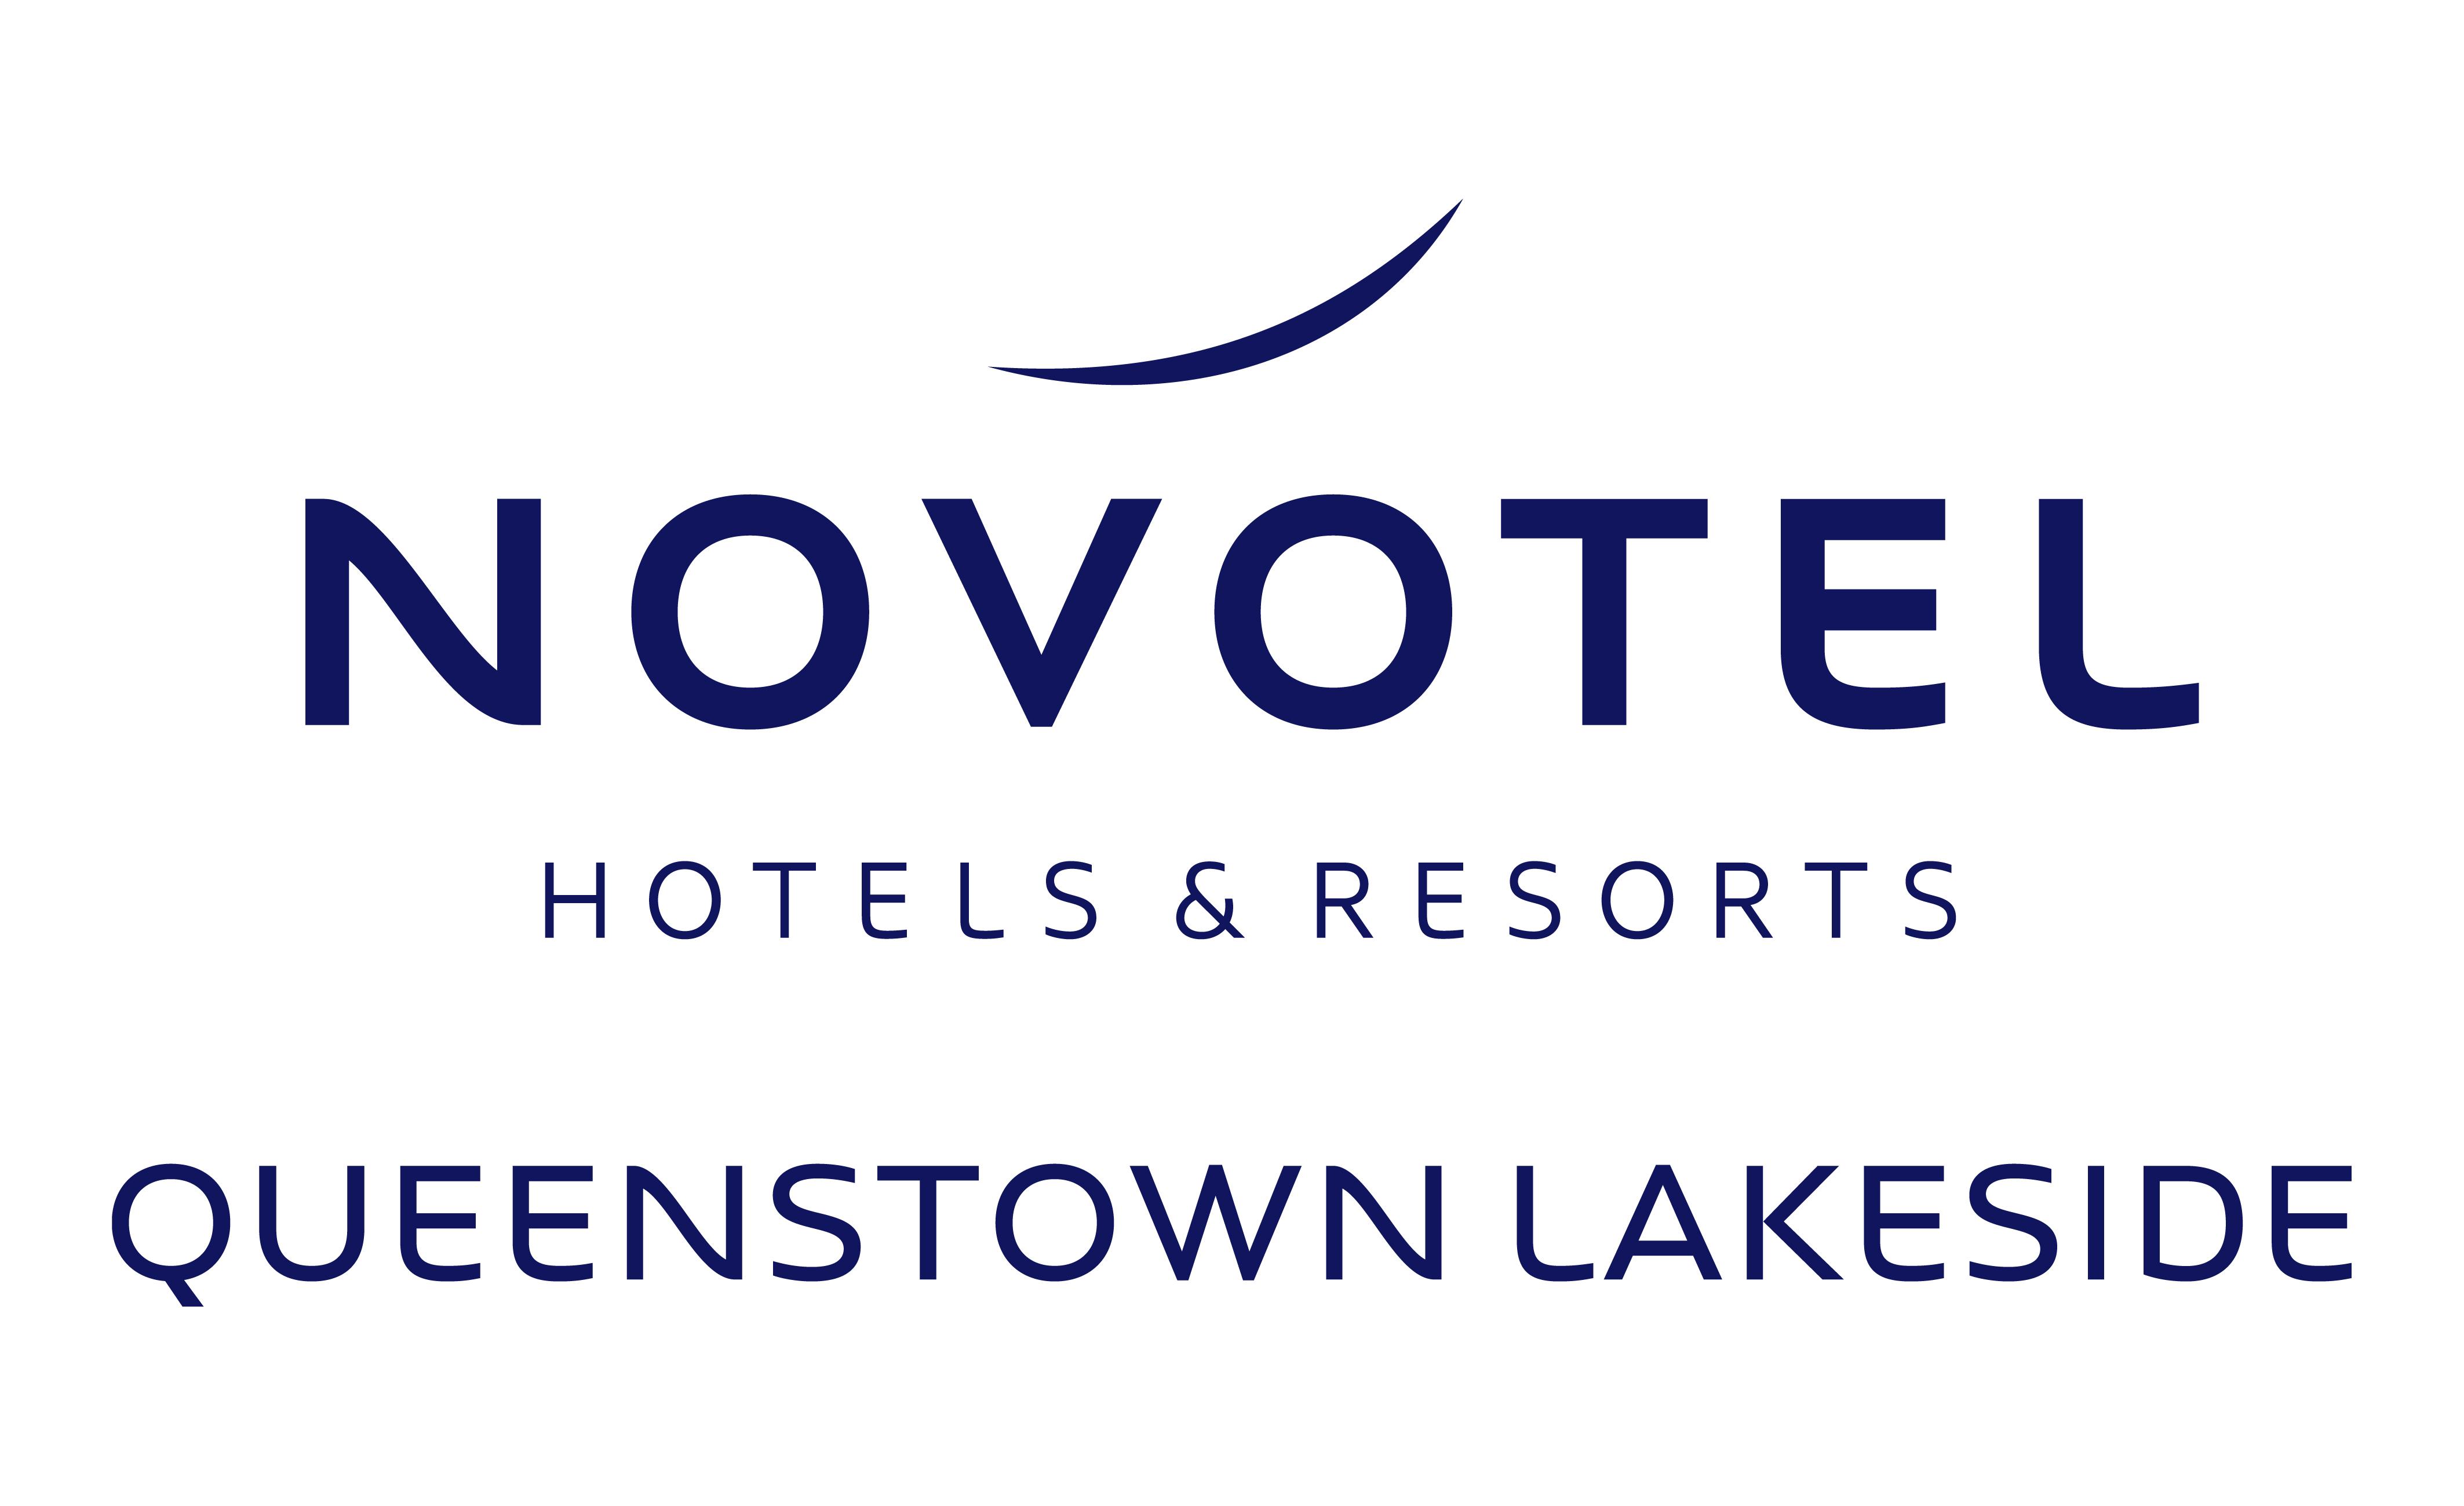 Novotel Queenstown Lakeside